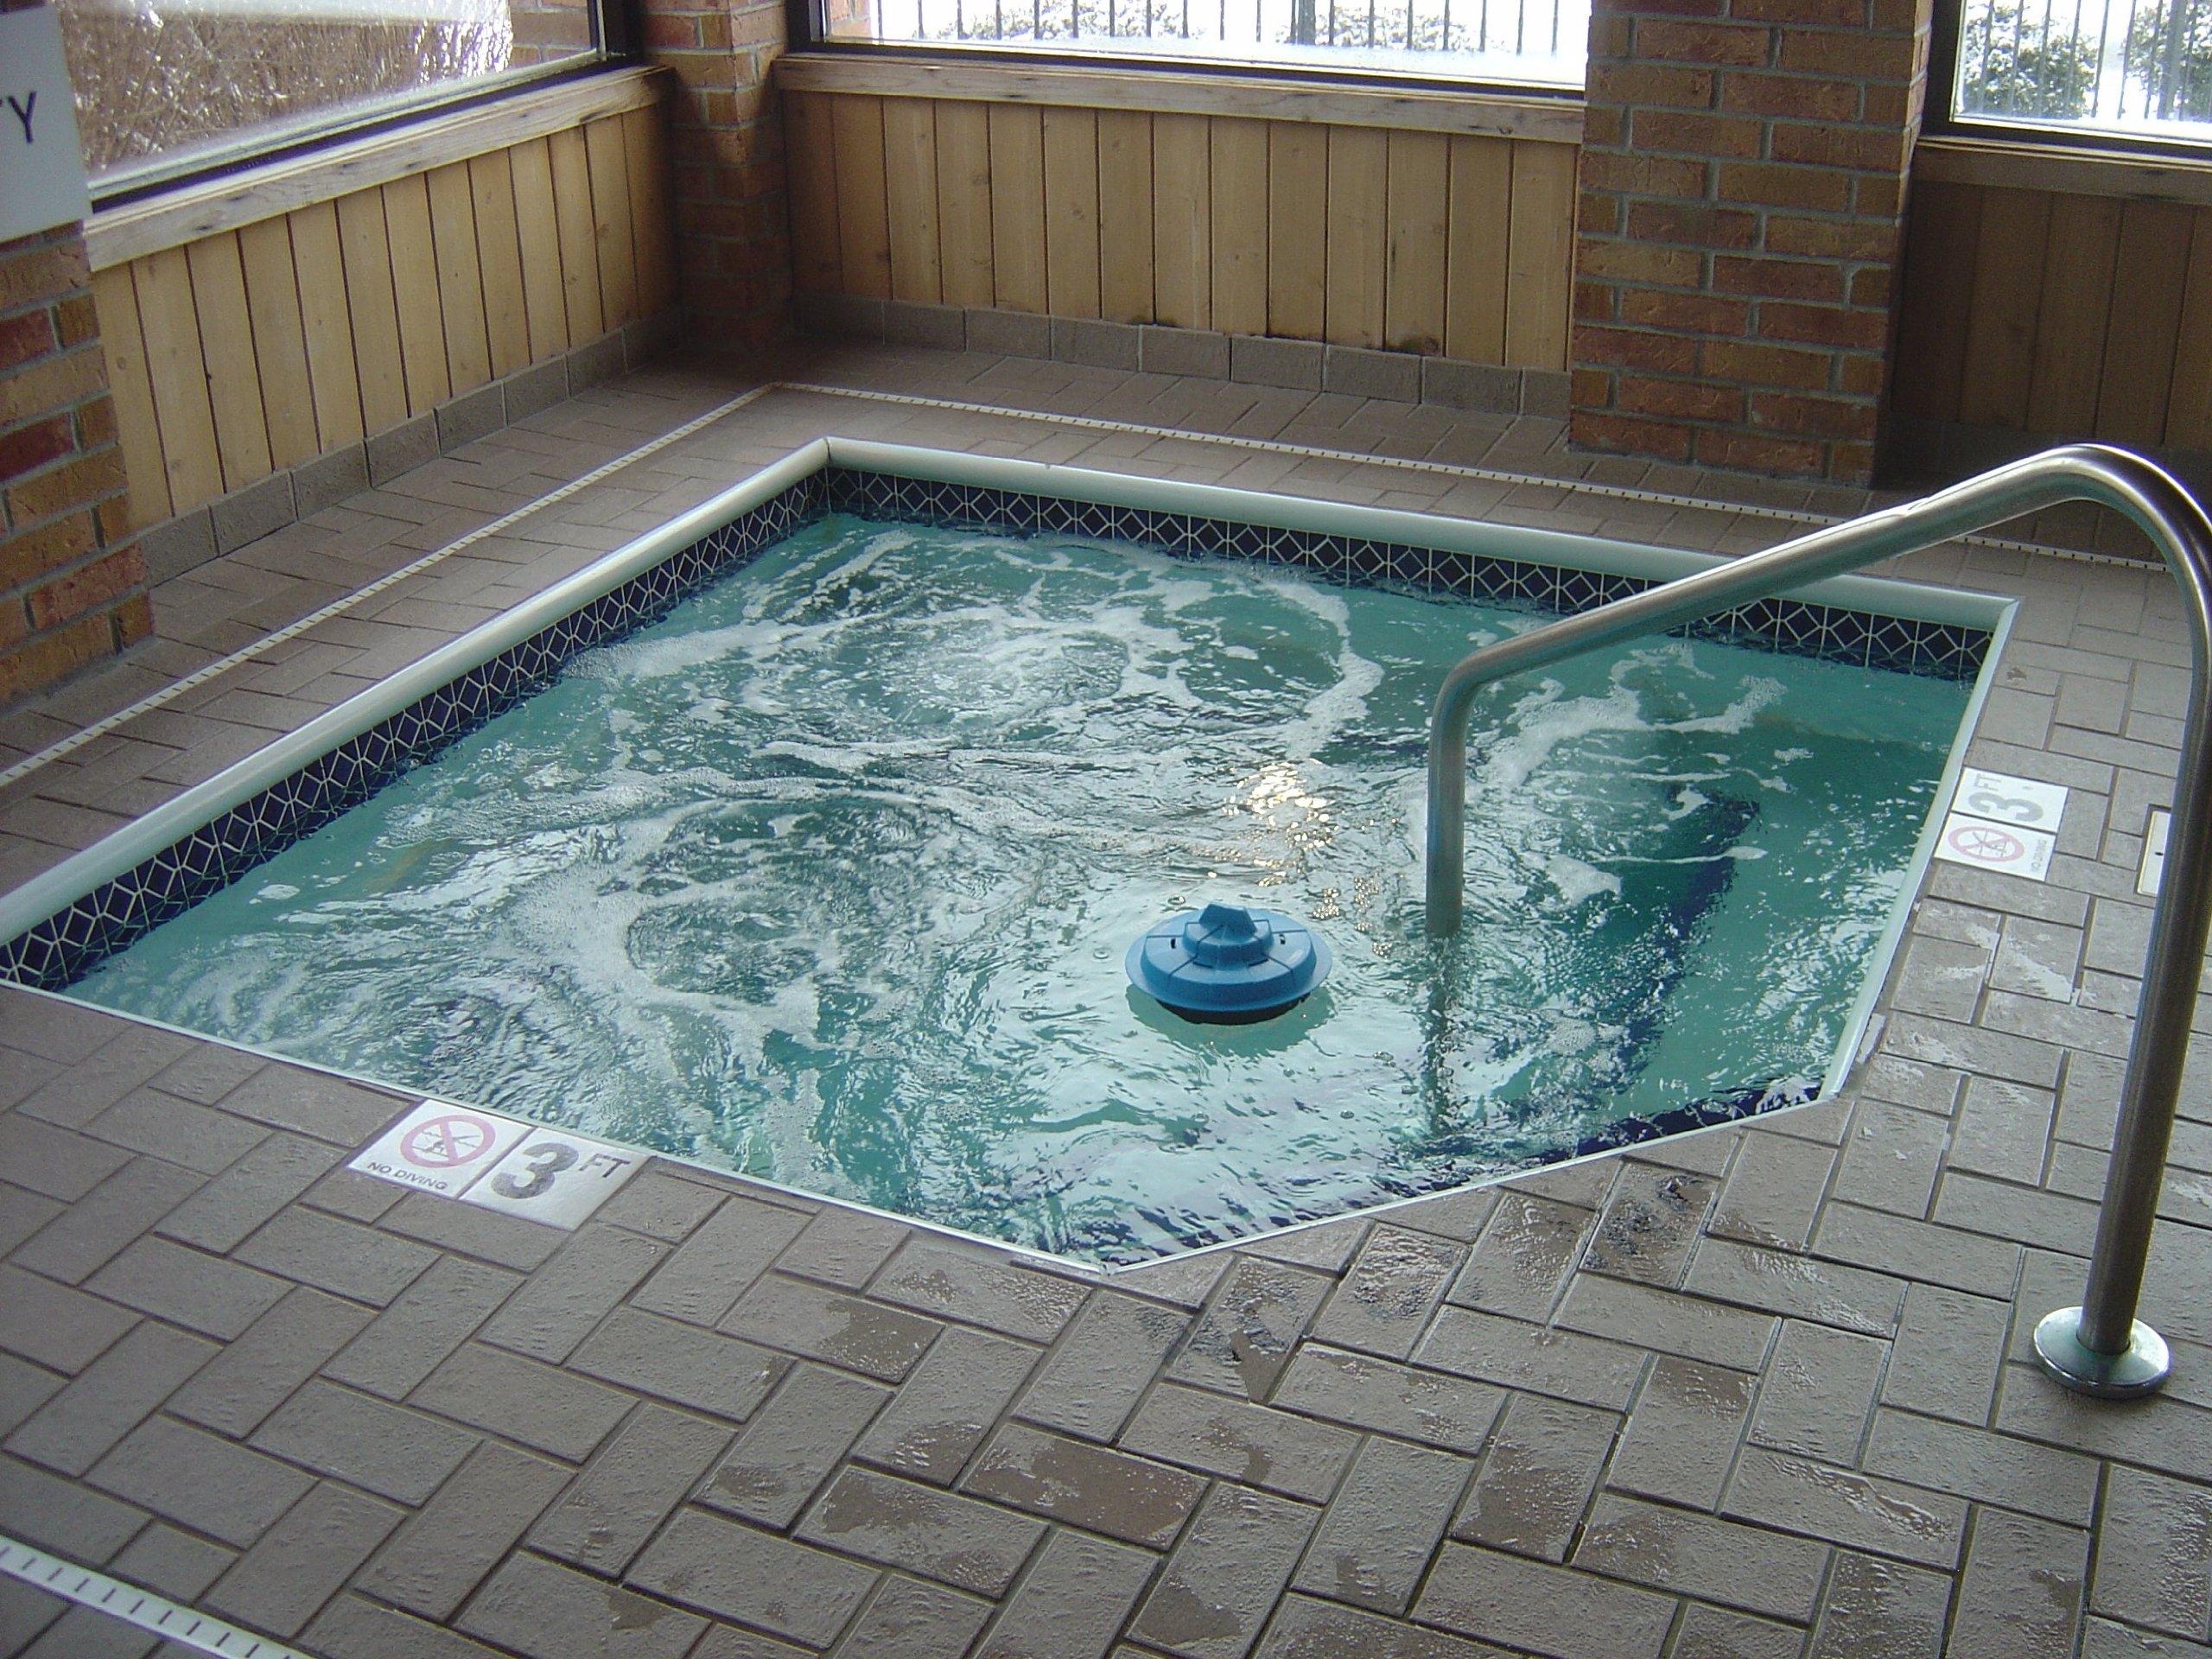 Pool Patrol PA-30 Pool Alarm by Pool Patrol (Image #1)